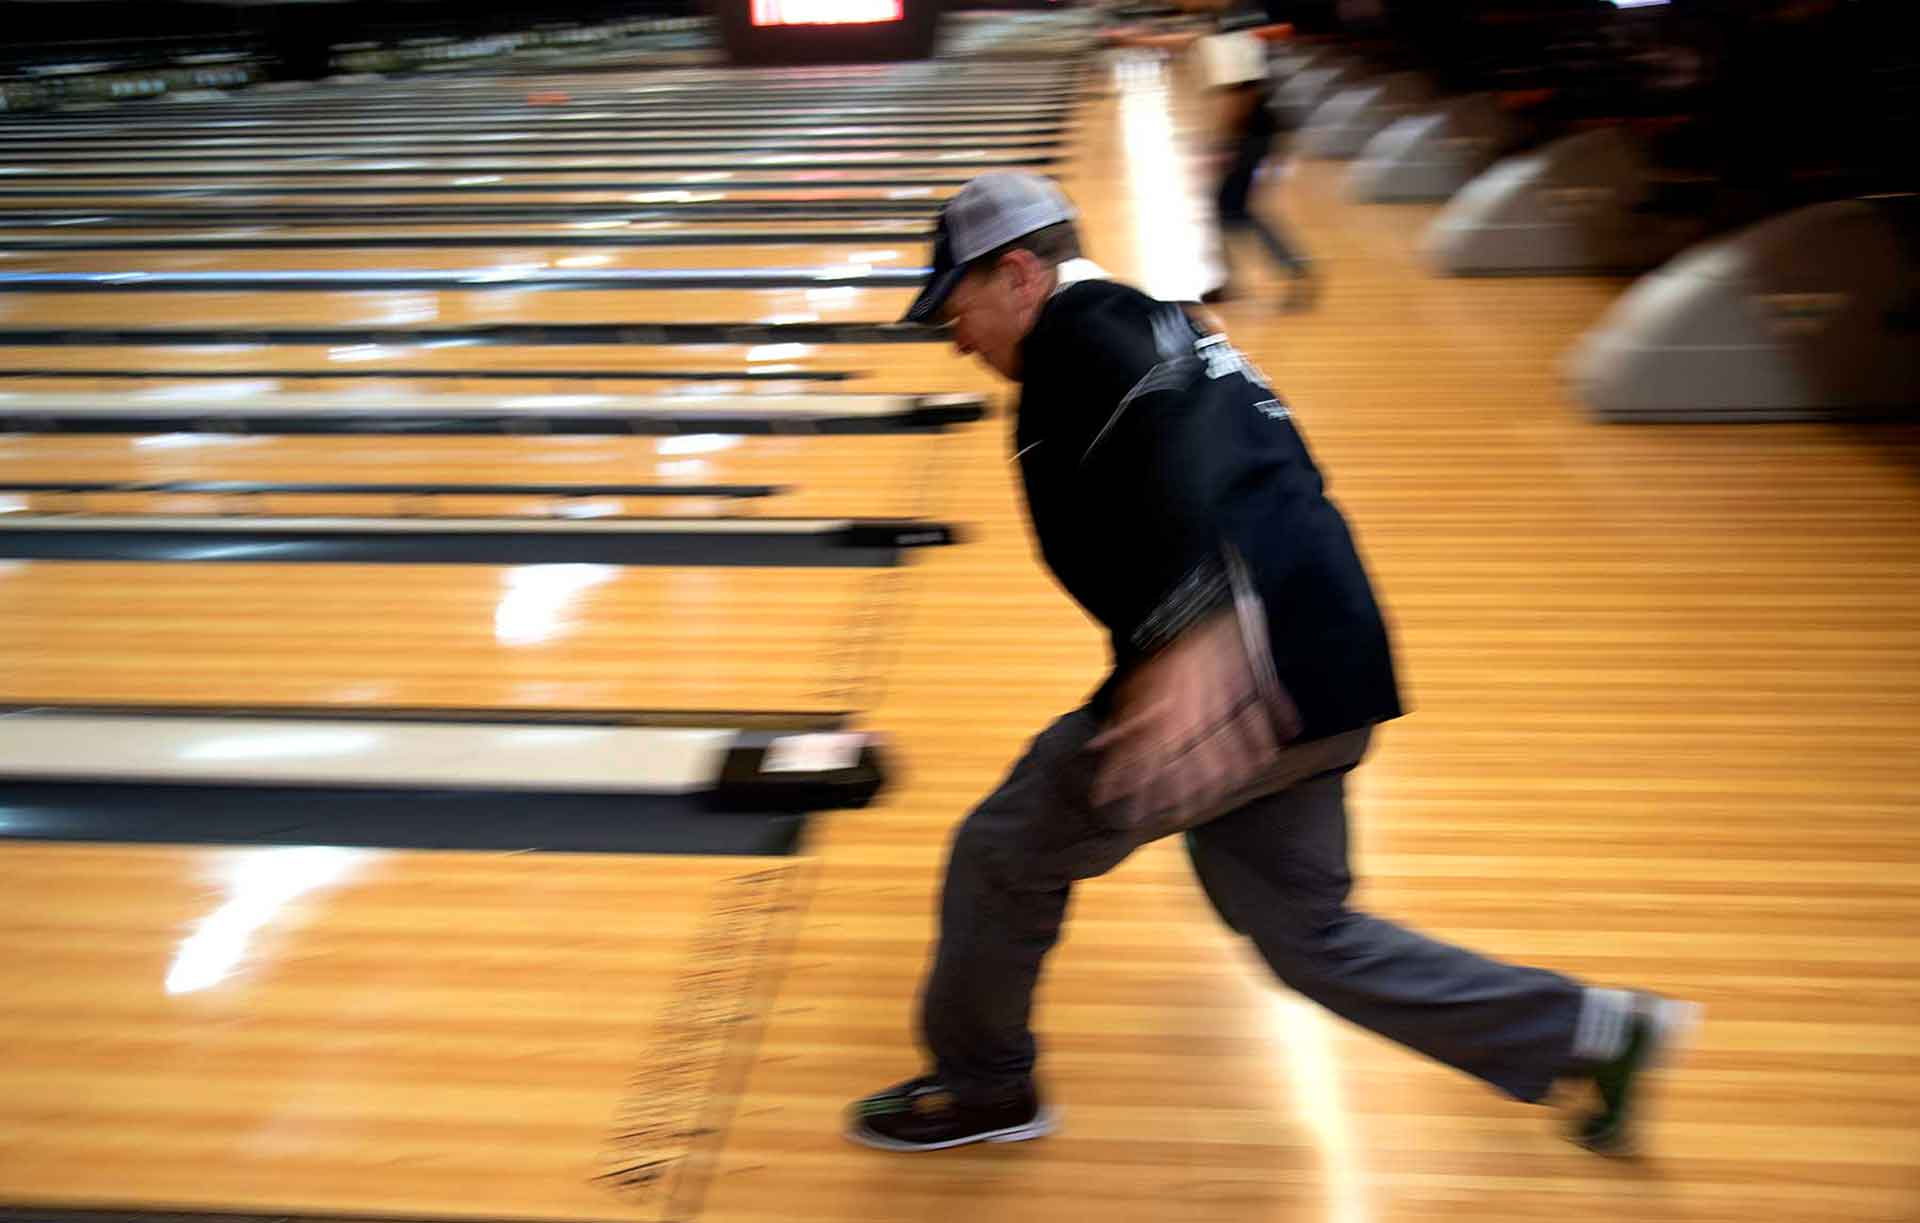 Bowling for Brains, Studio City, CA